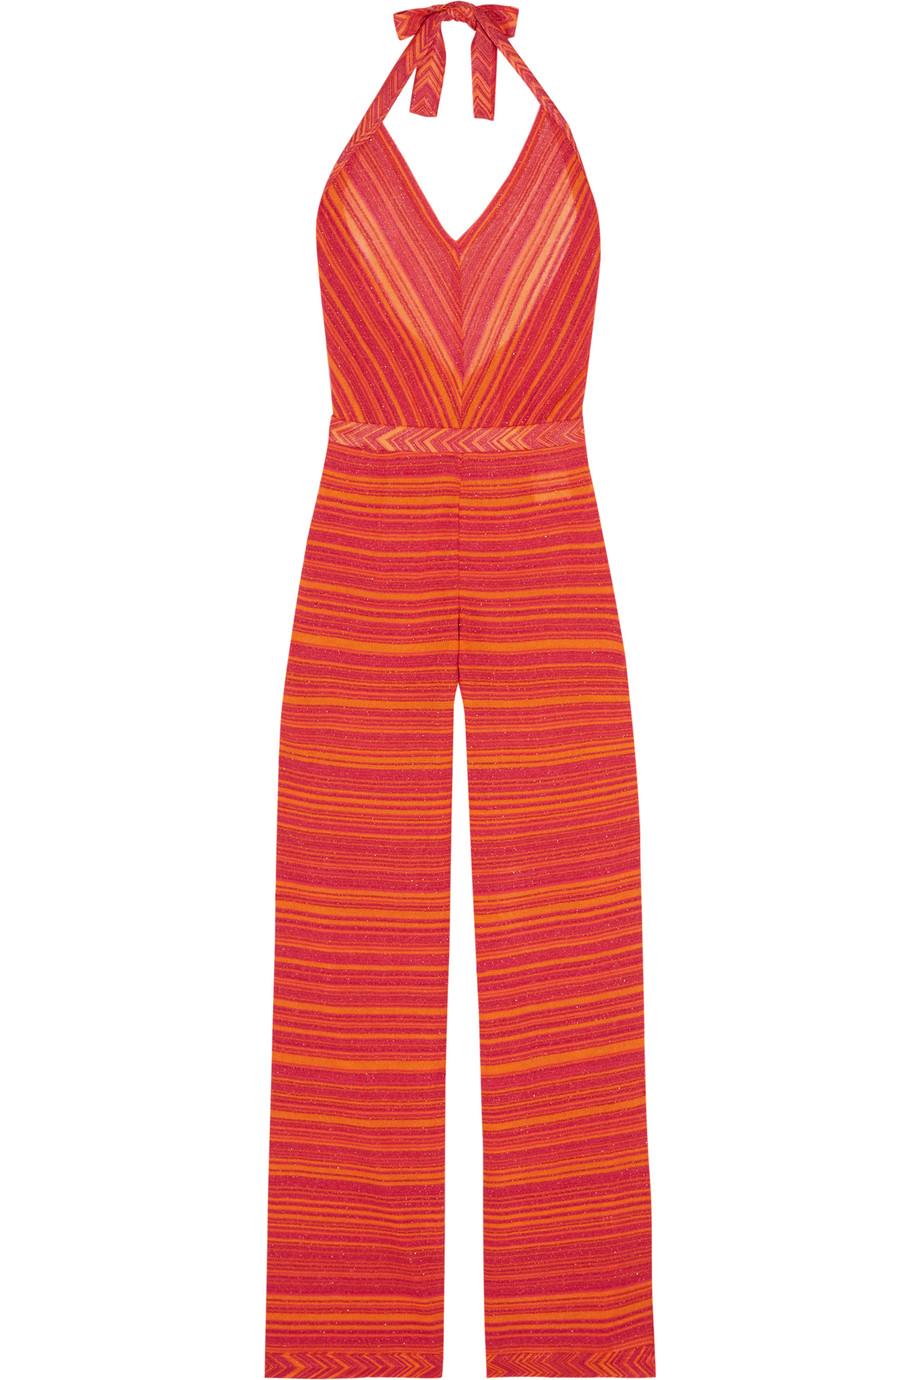 Missoni Mare Metallic Crochet-Knit Jumpsuit, Red/Orange, Women's, Size: 44